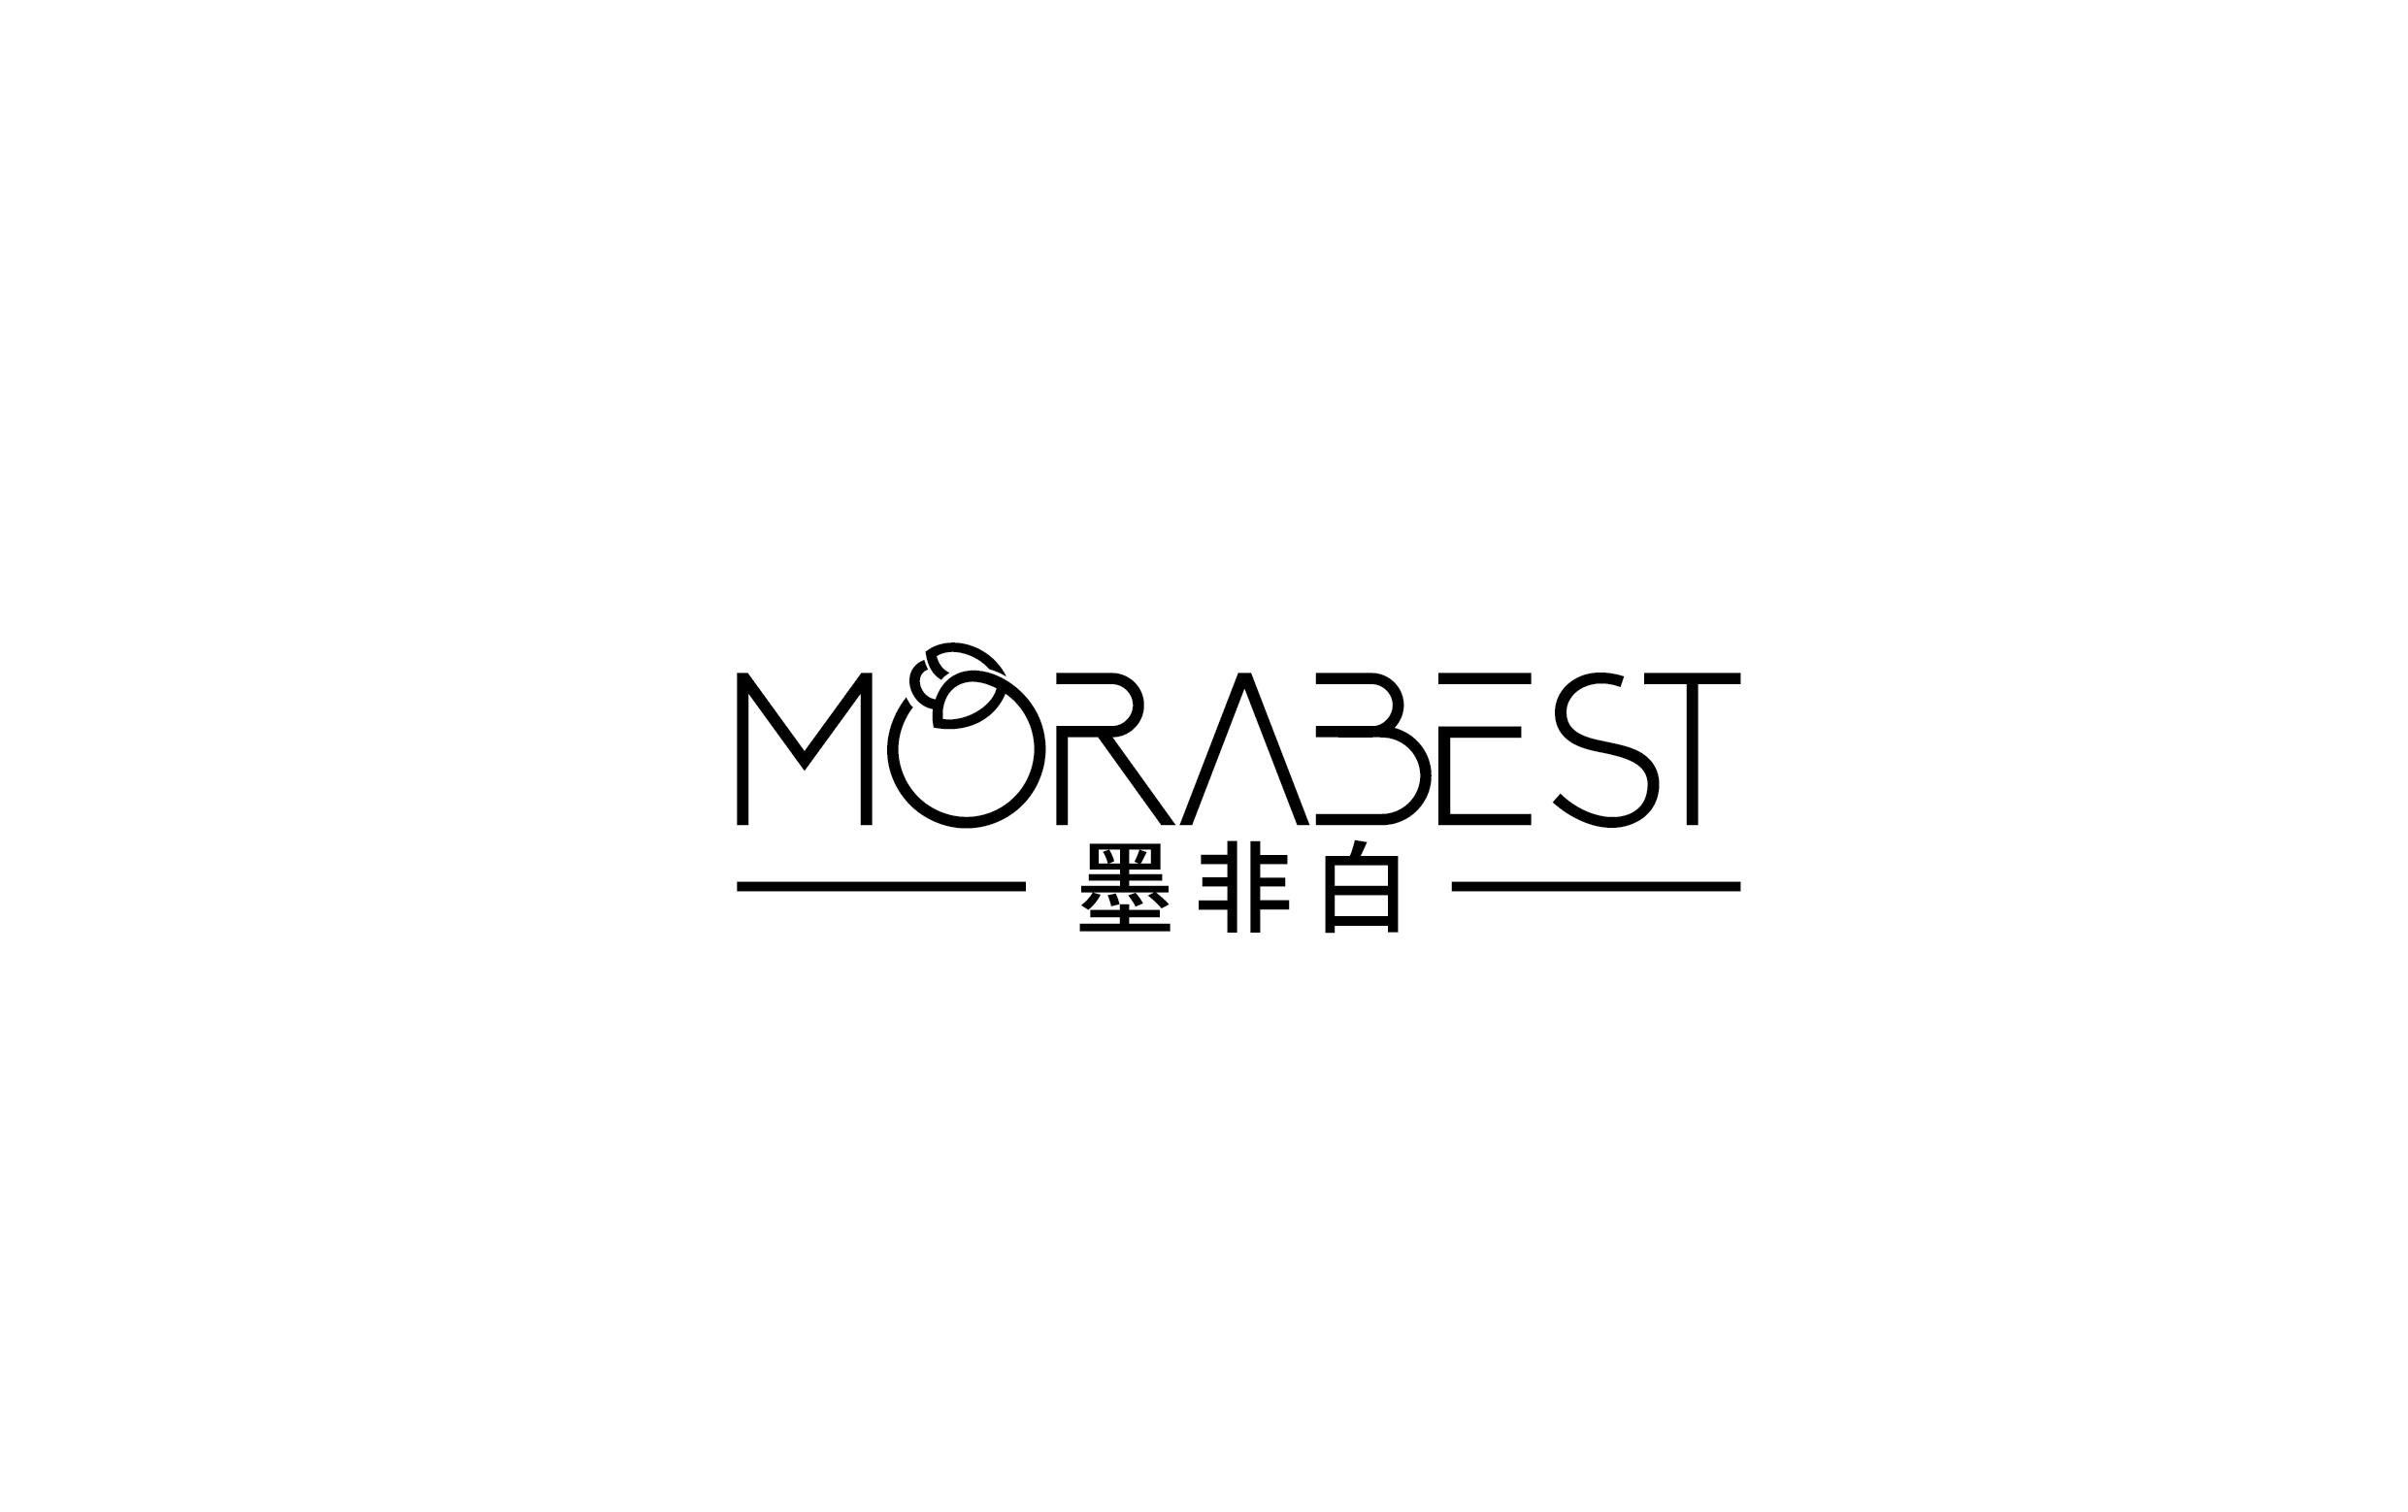 MORABEST